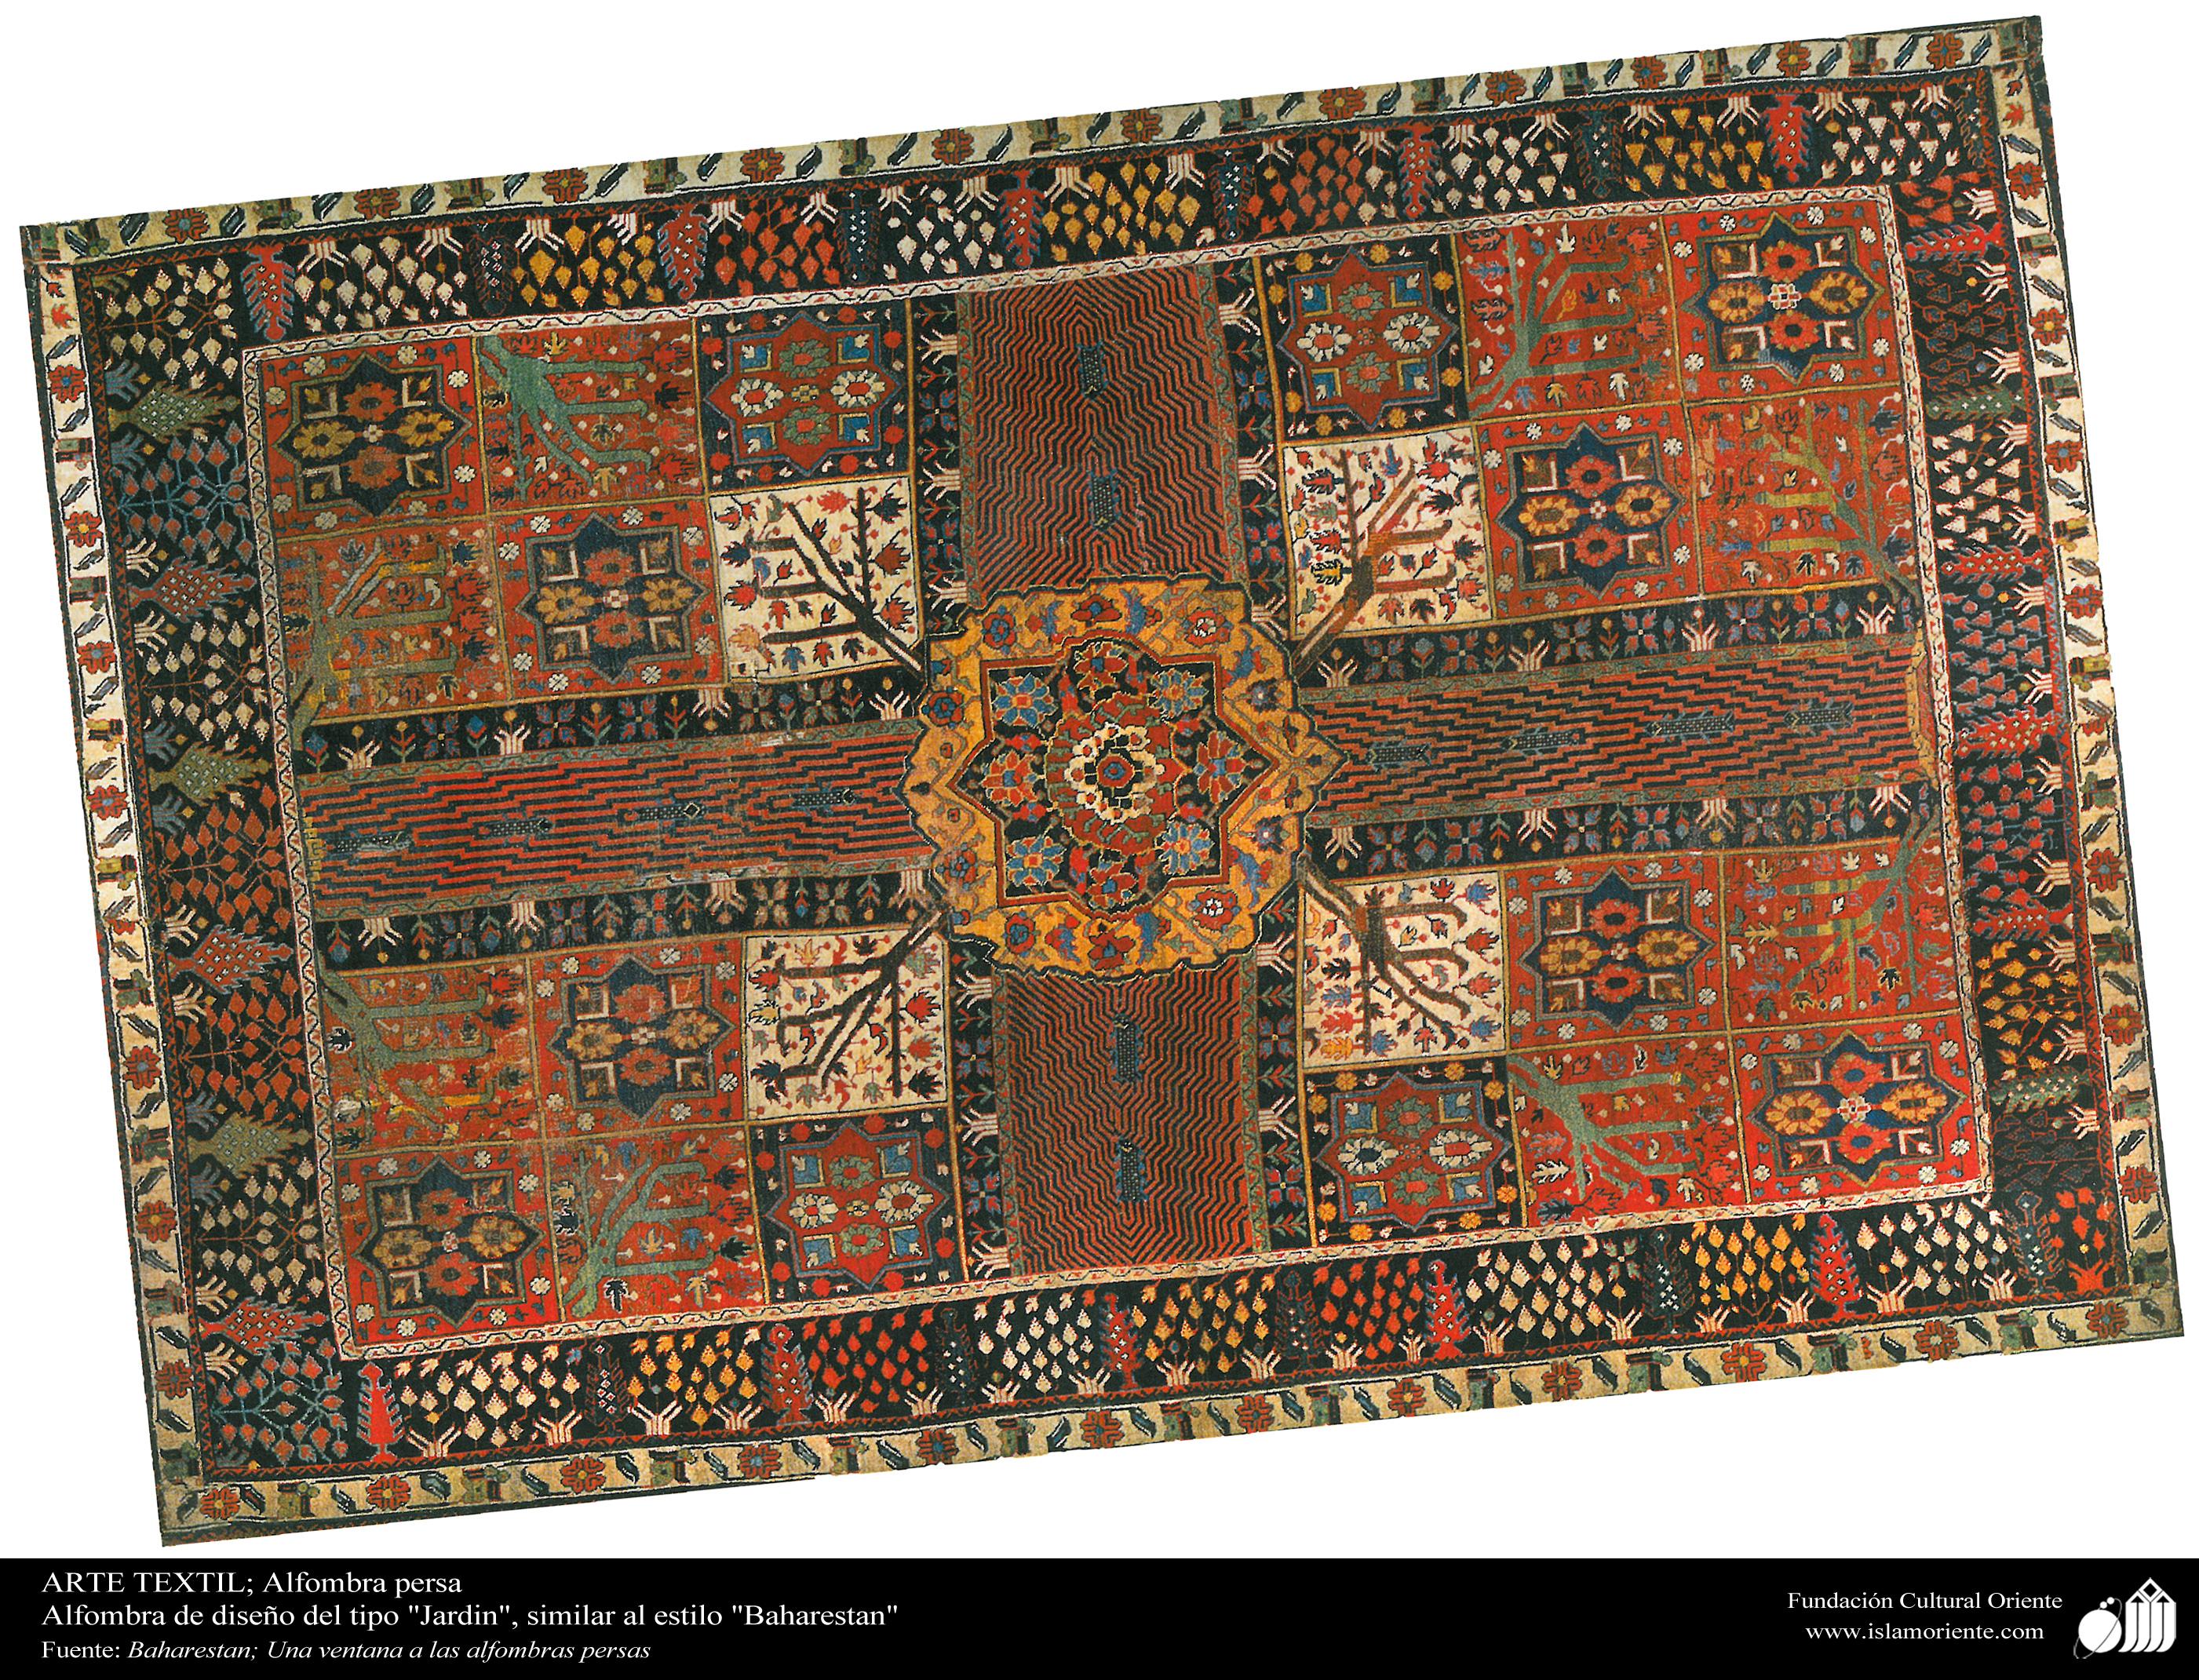 Alfombra persa alfombra de dise o del tipo jardin for Tipos de alfombras